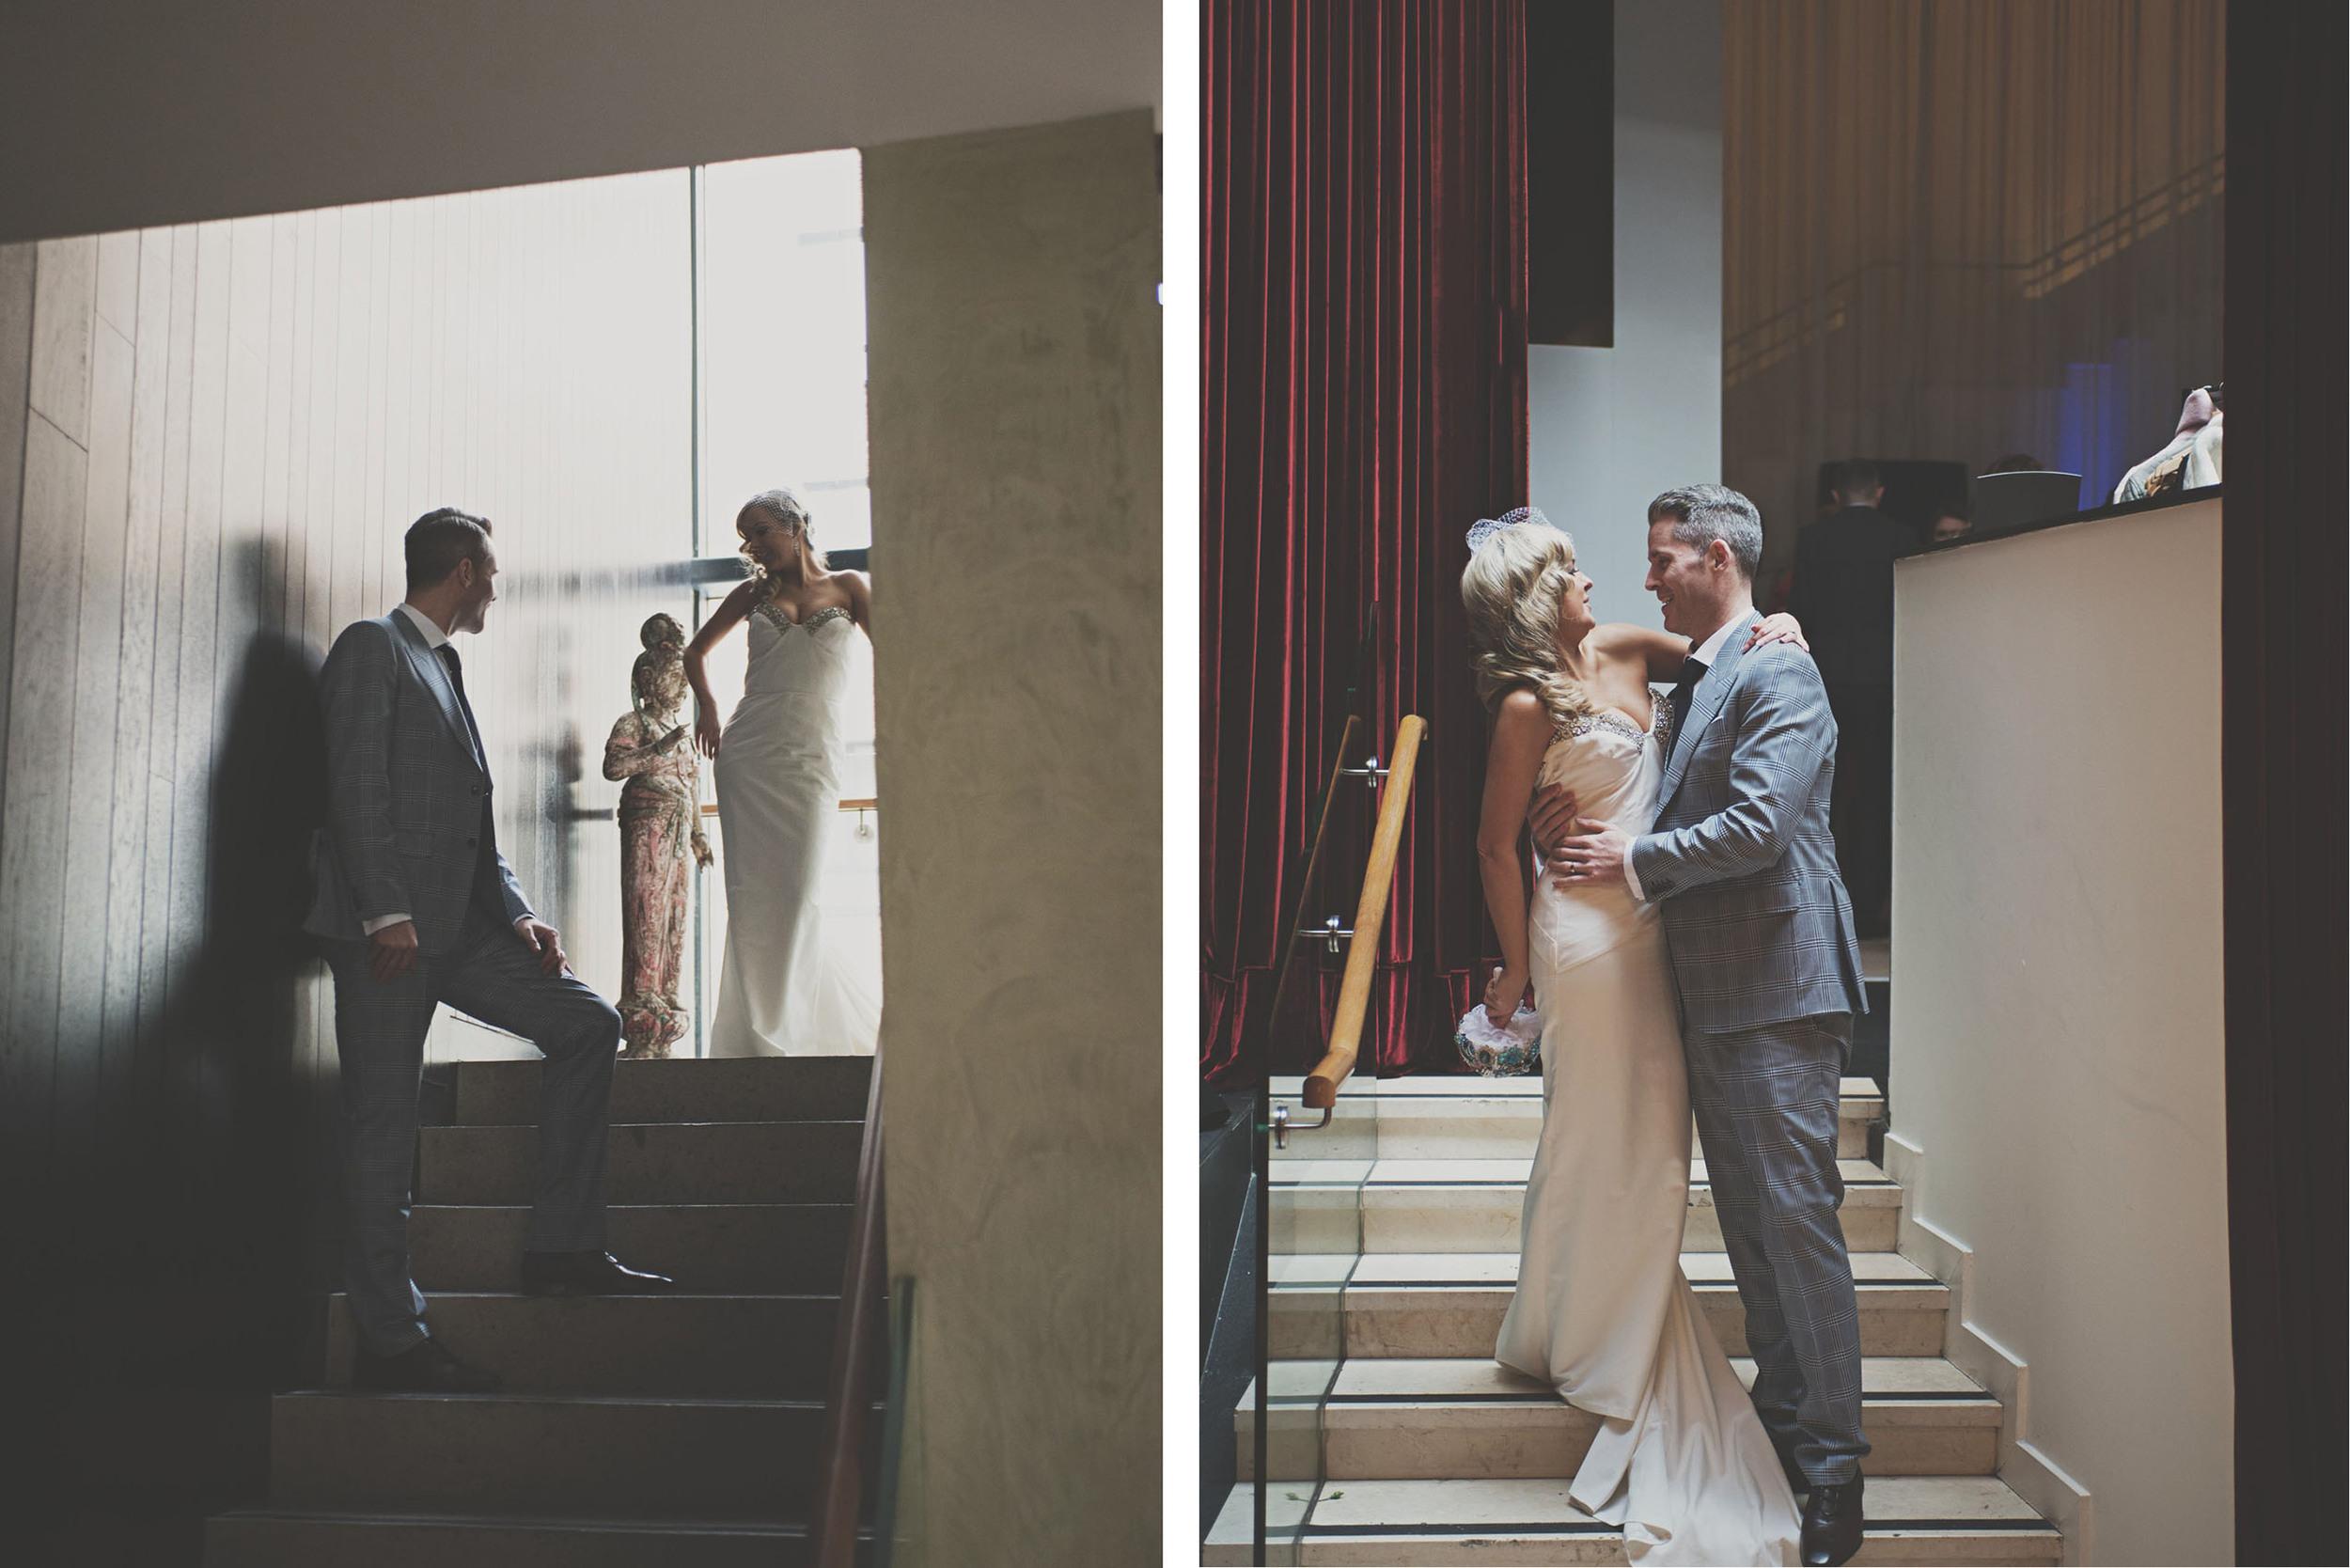 Morrison Hotel wedding, Dublin